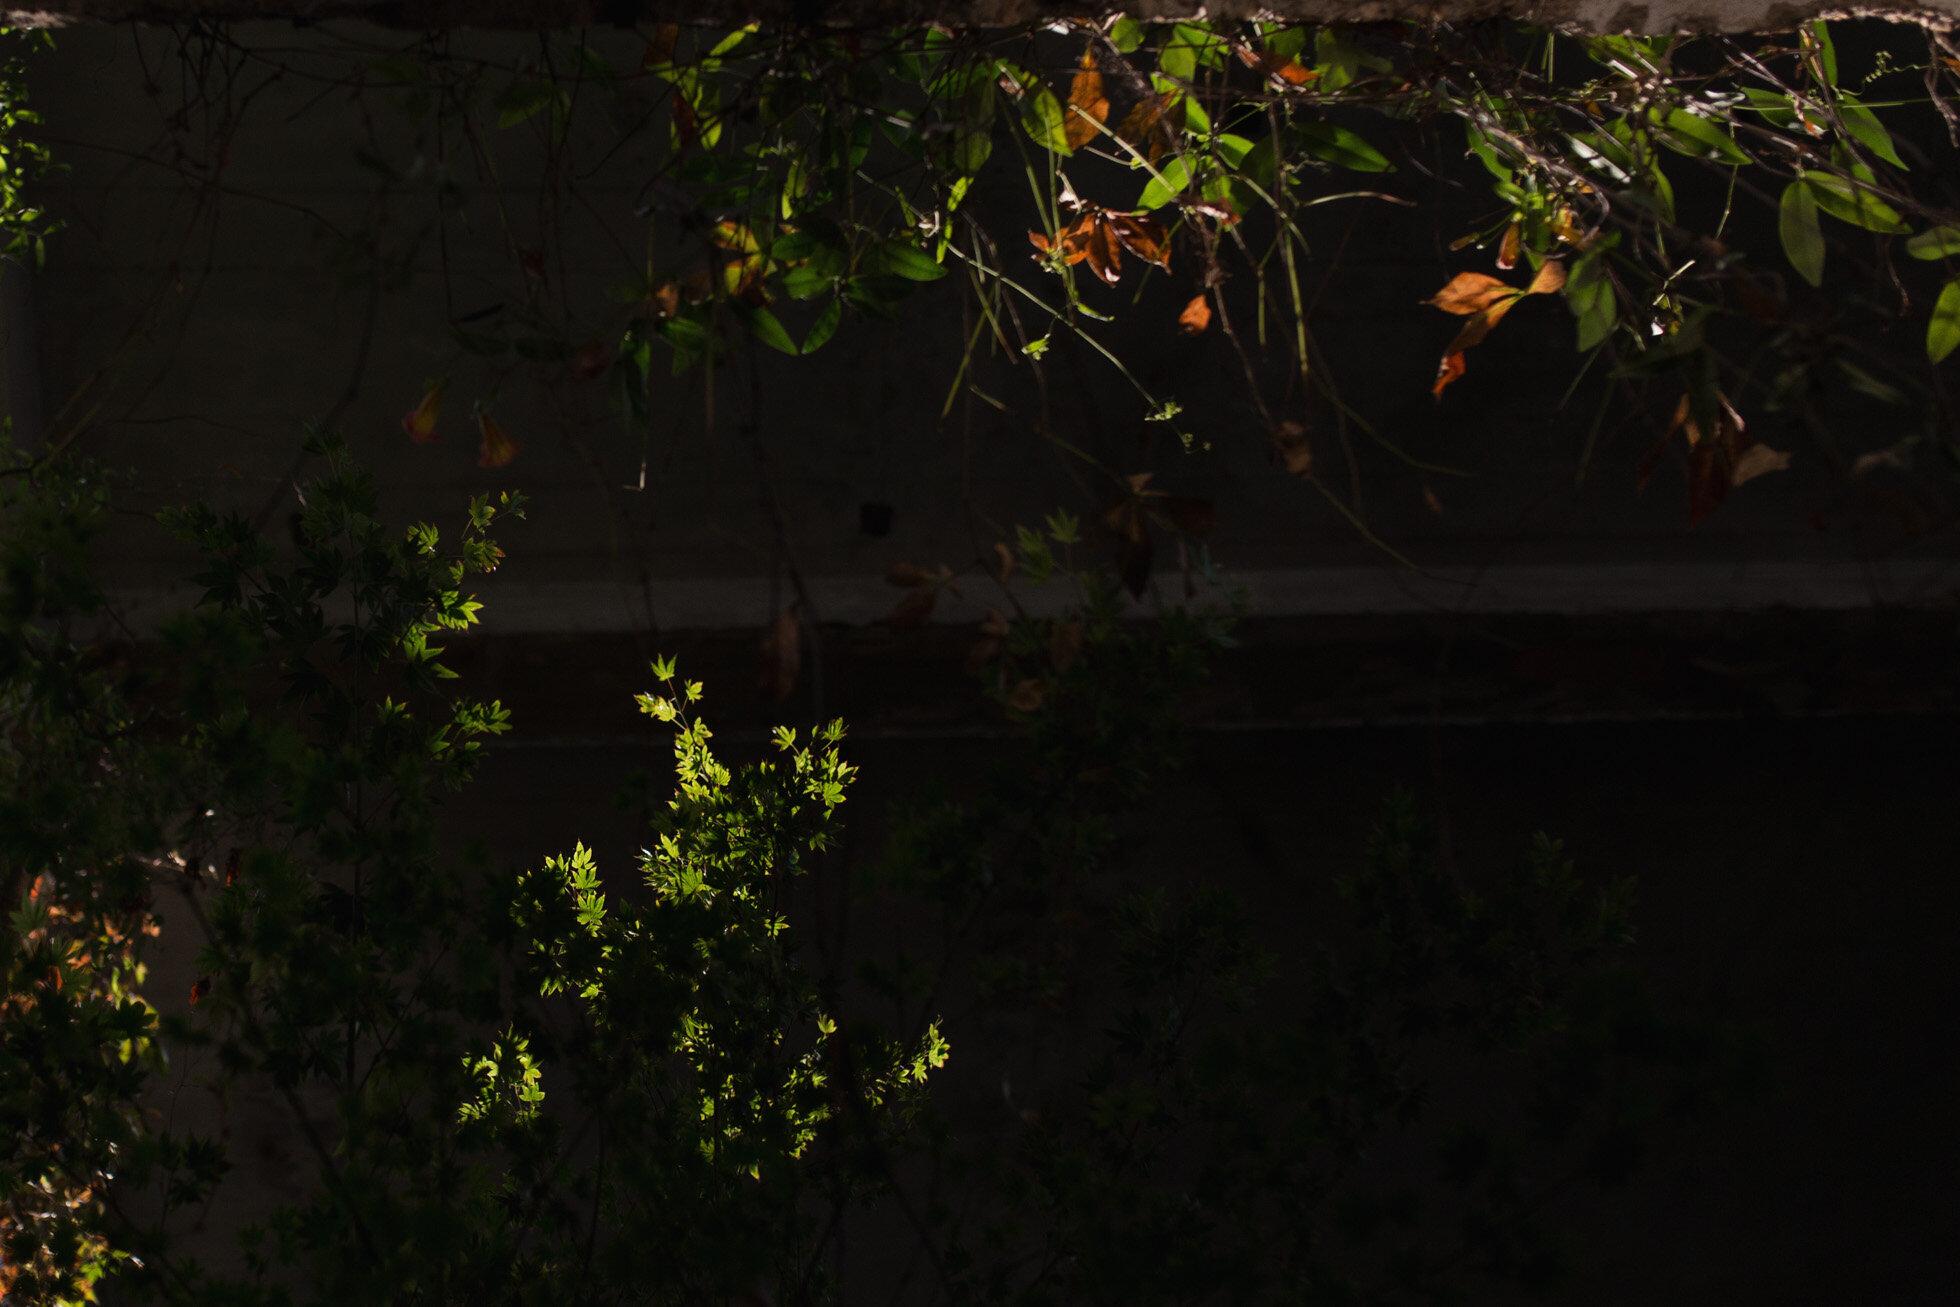 september13_leanne_hymes_photography.jpg